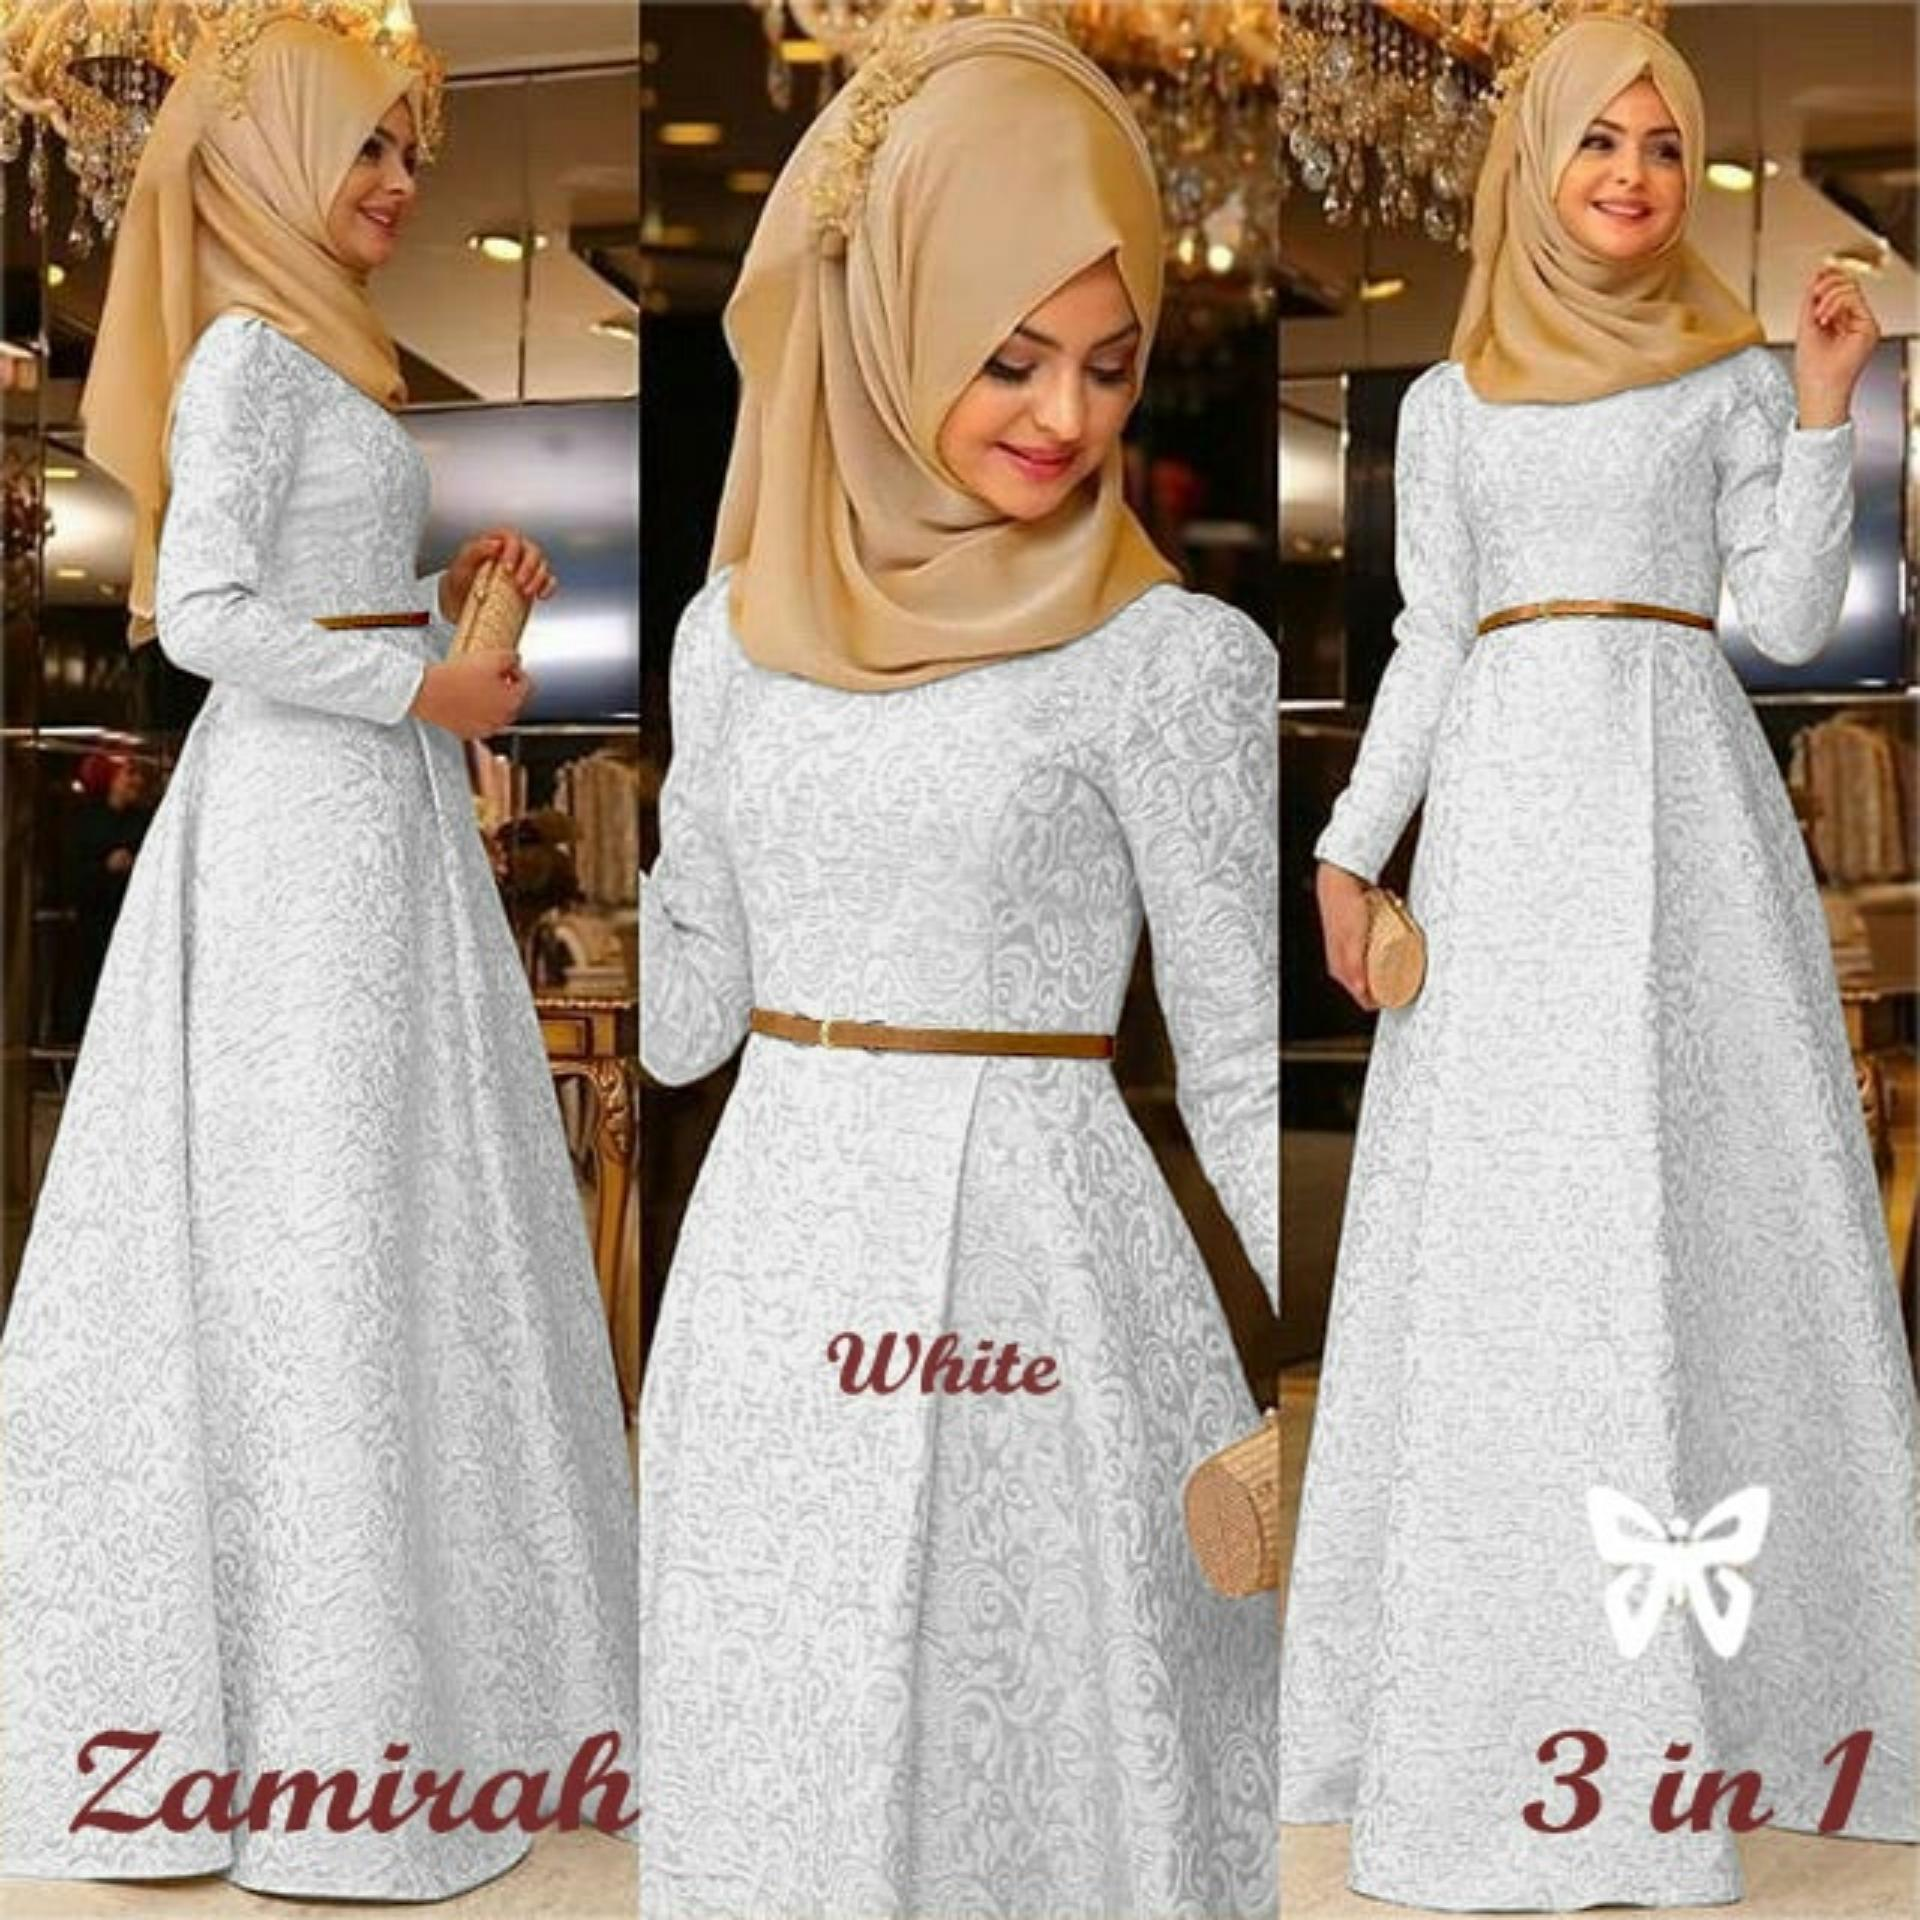 UC Dress Gamis Muslim Mirah / Hijab Muslim / Muslim Syari Hijab Syar'i / Busana Muslimah / Kebaya Modern Lebaran (Mirahza)  SS - Putih White / Gaun Pesta Lengan Panjang 2018